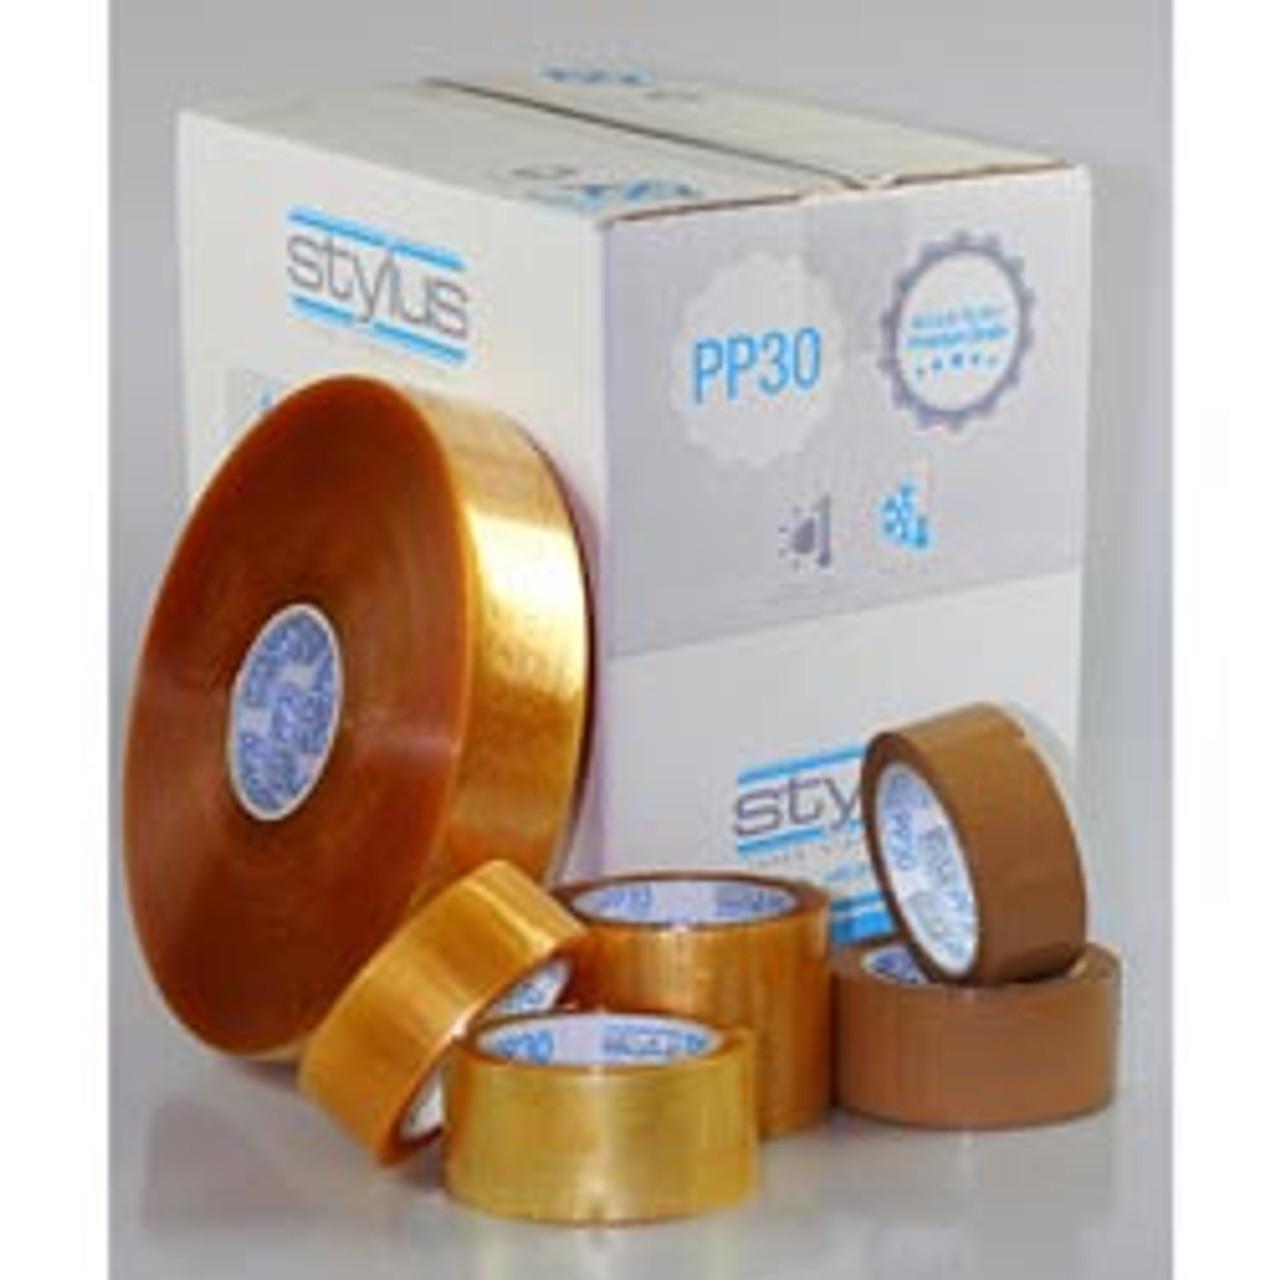 Stylus Pp30 Packaging Tape Transparent 48mmx1000m 1 Carton 6 Rolls Per Ctn Nuprint Office Choice